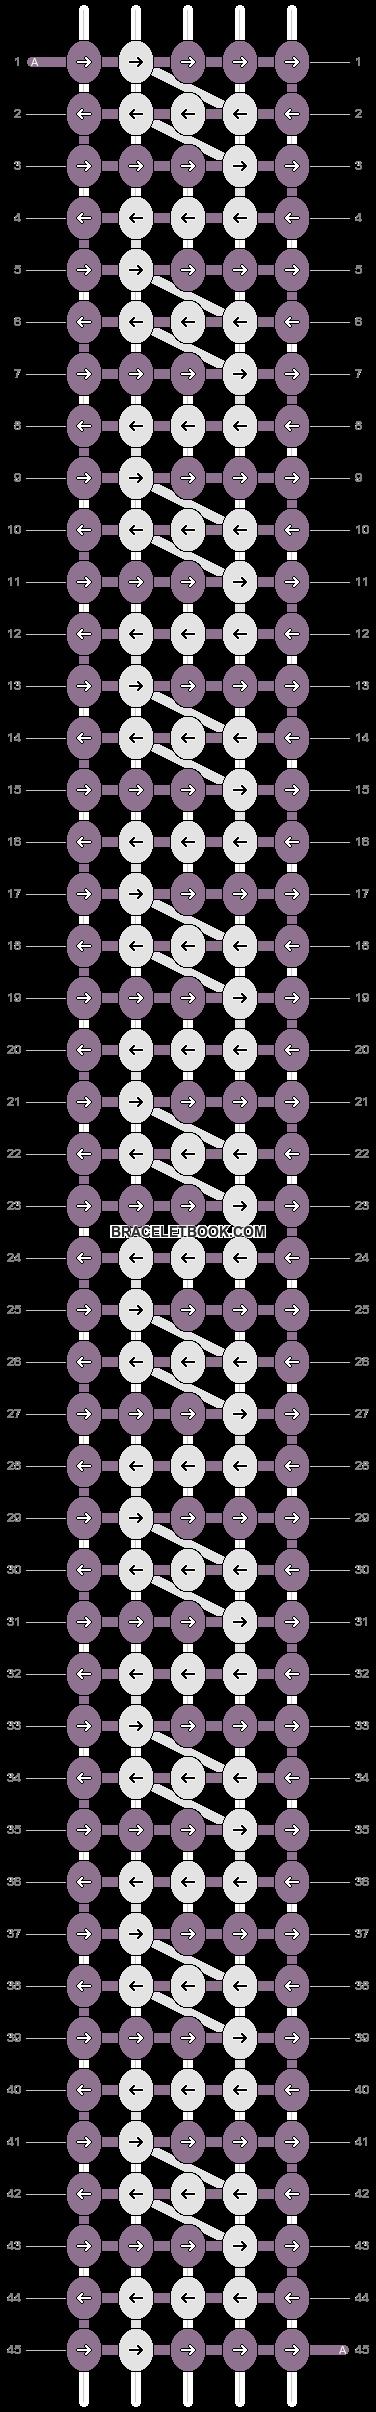 Alpha pattern #17859 pattern